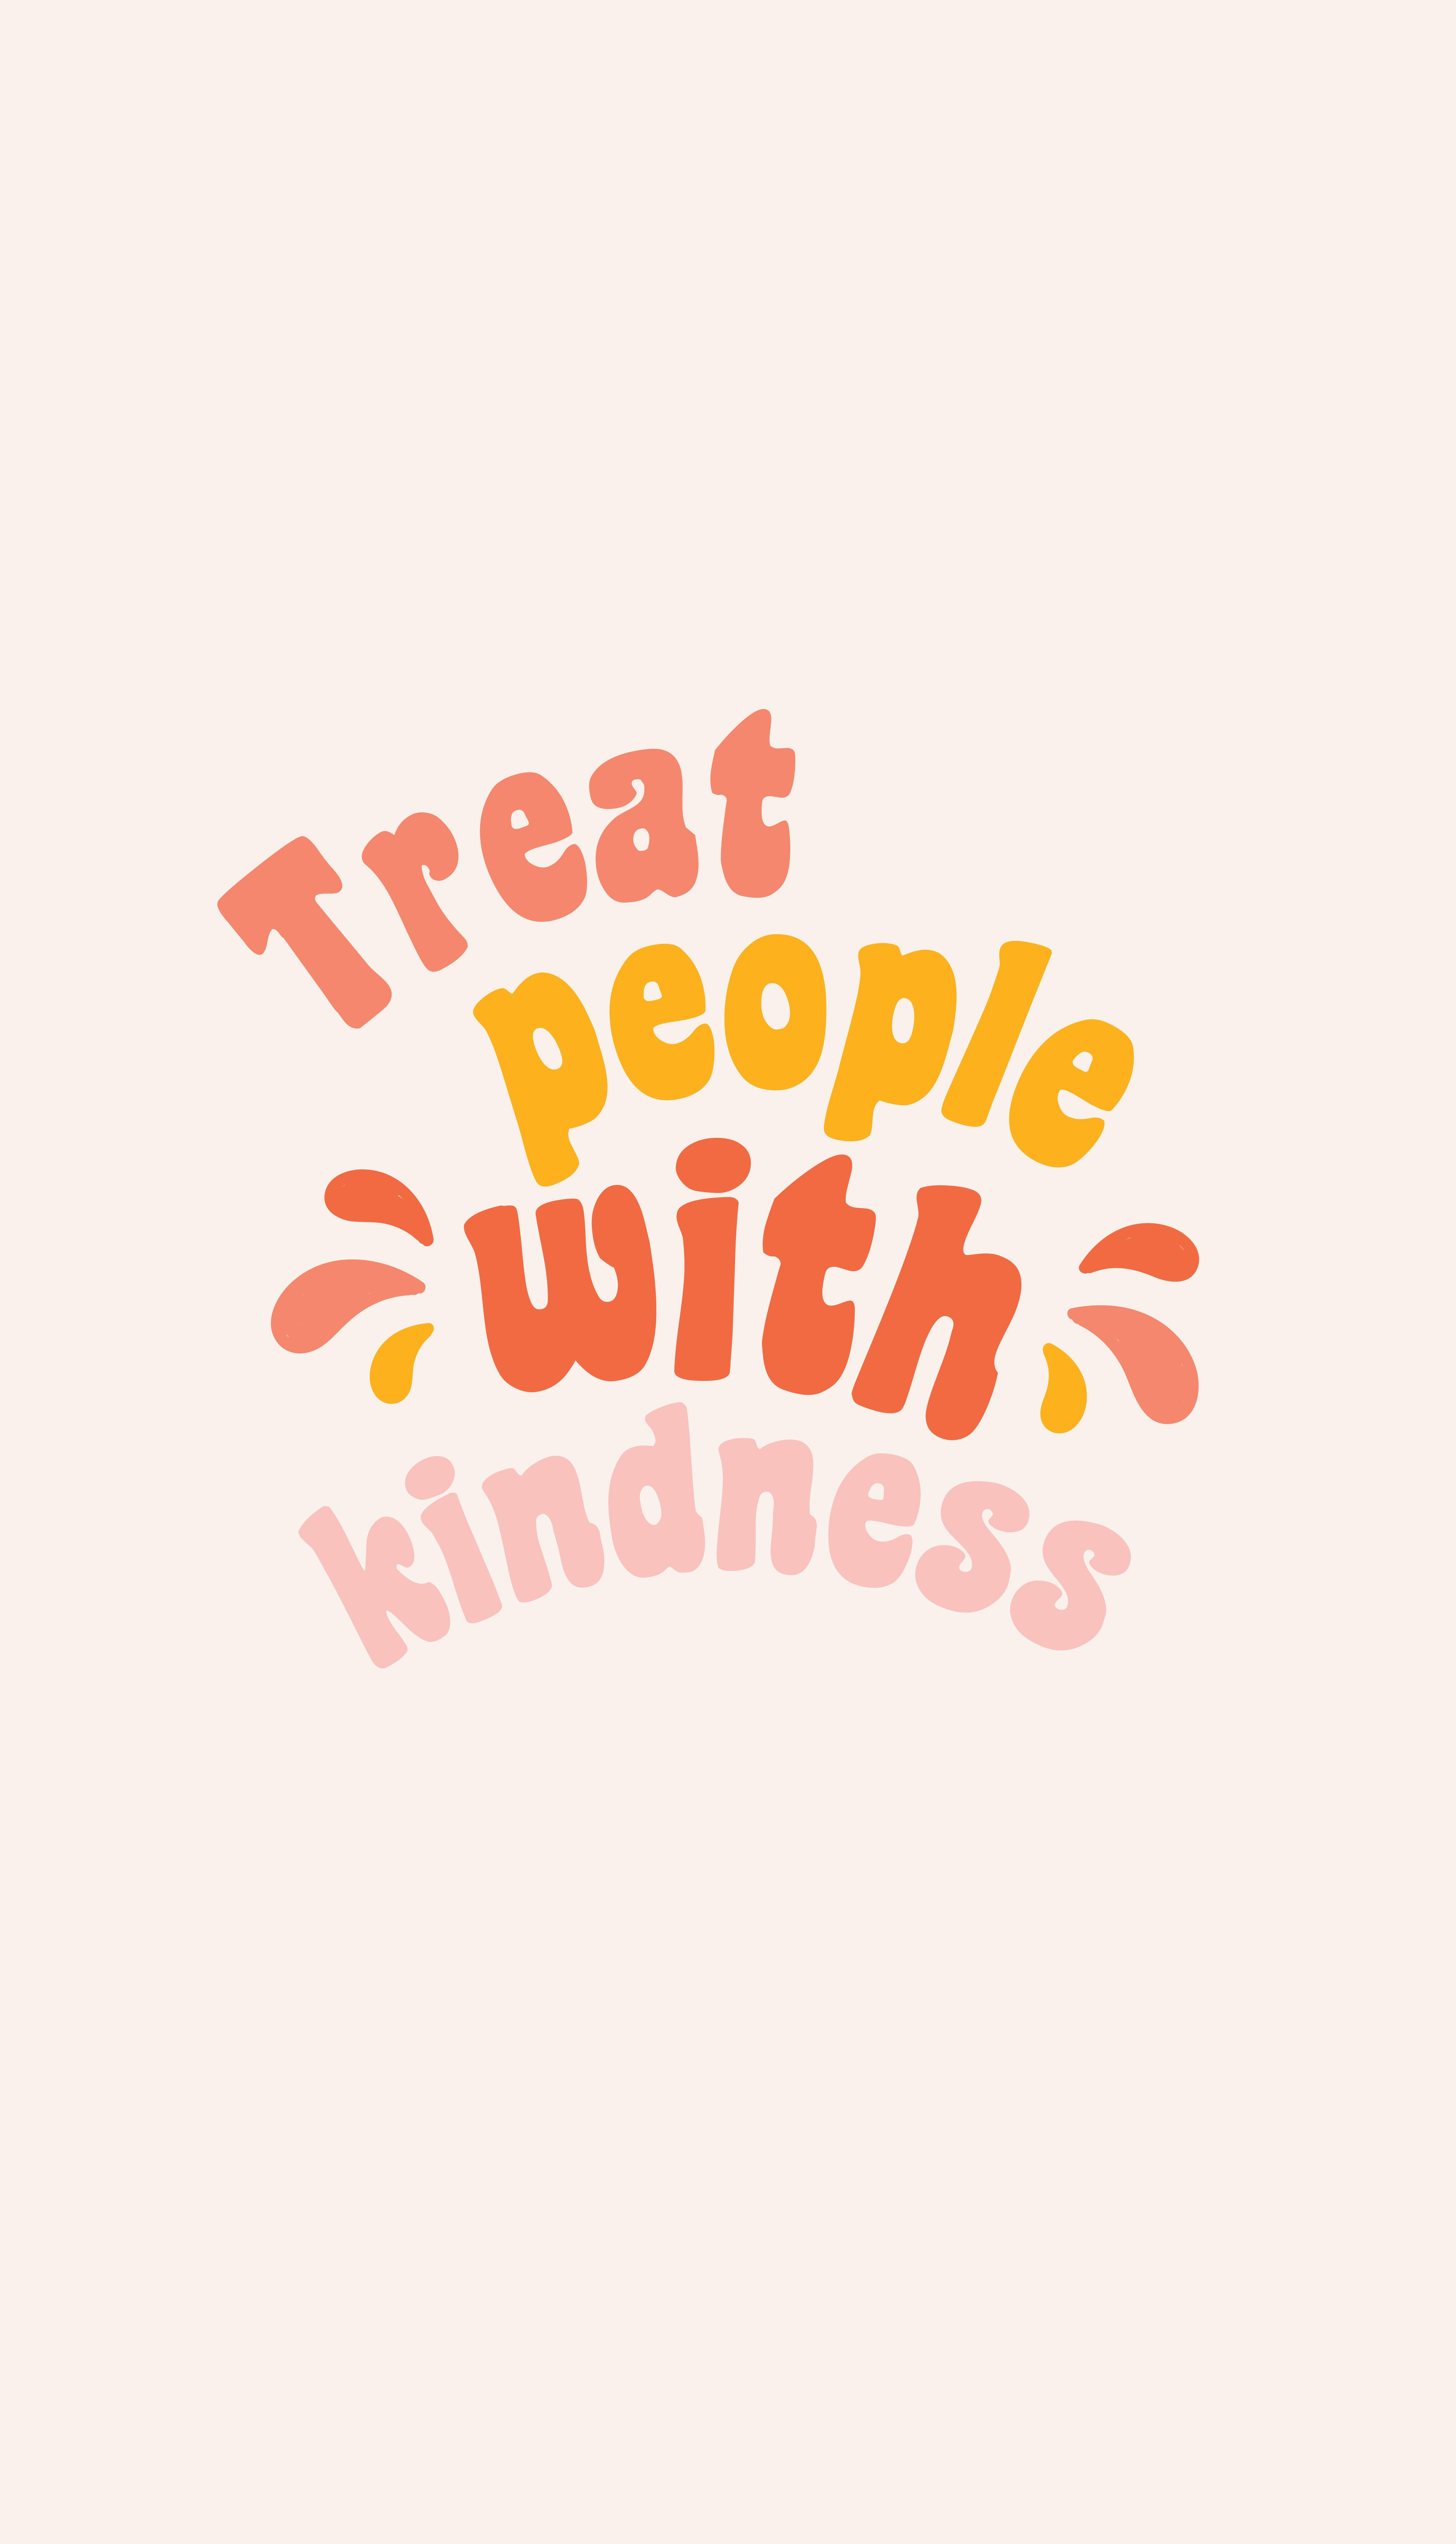 Treat people with kindness lyrics | phone wallpaper